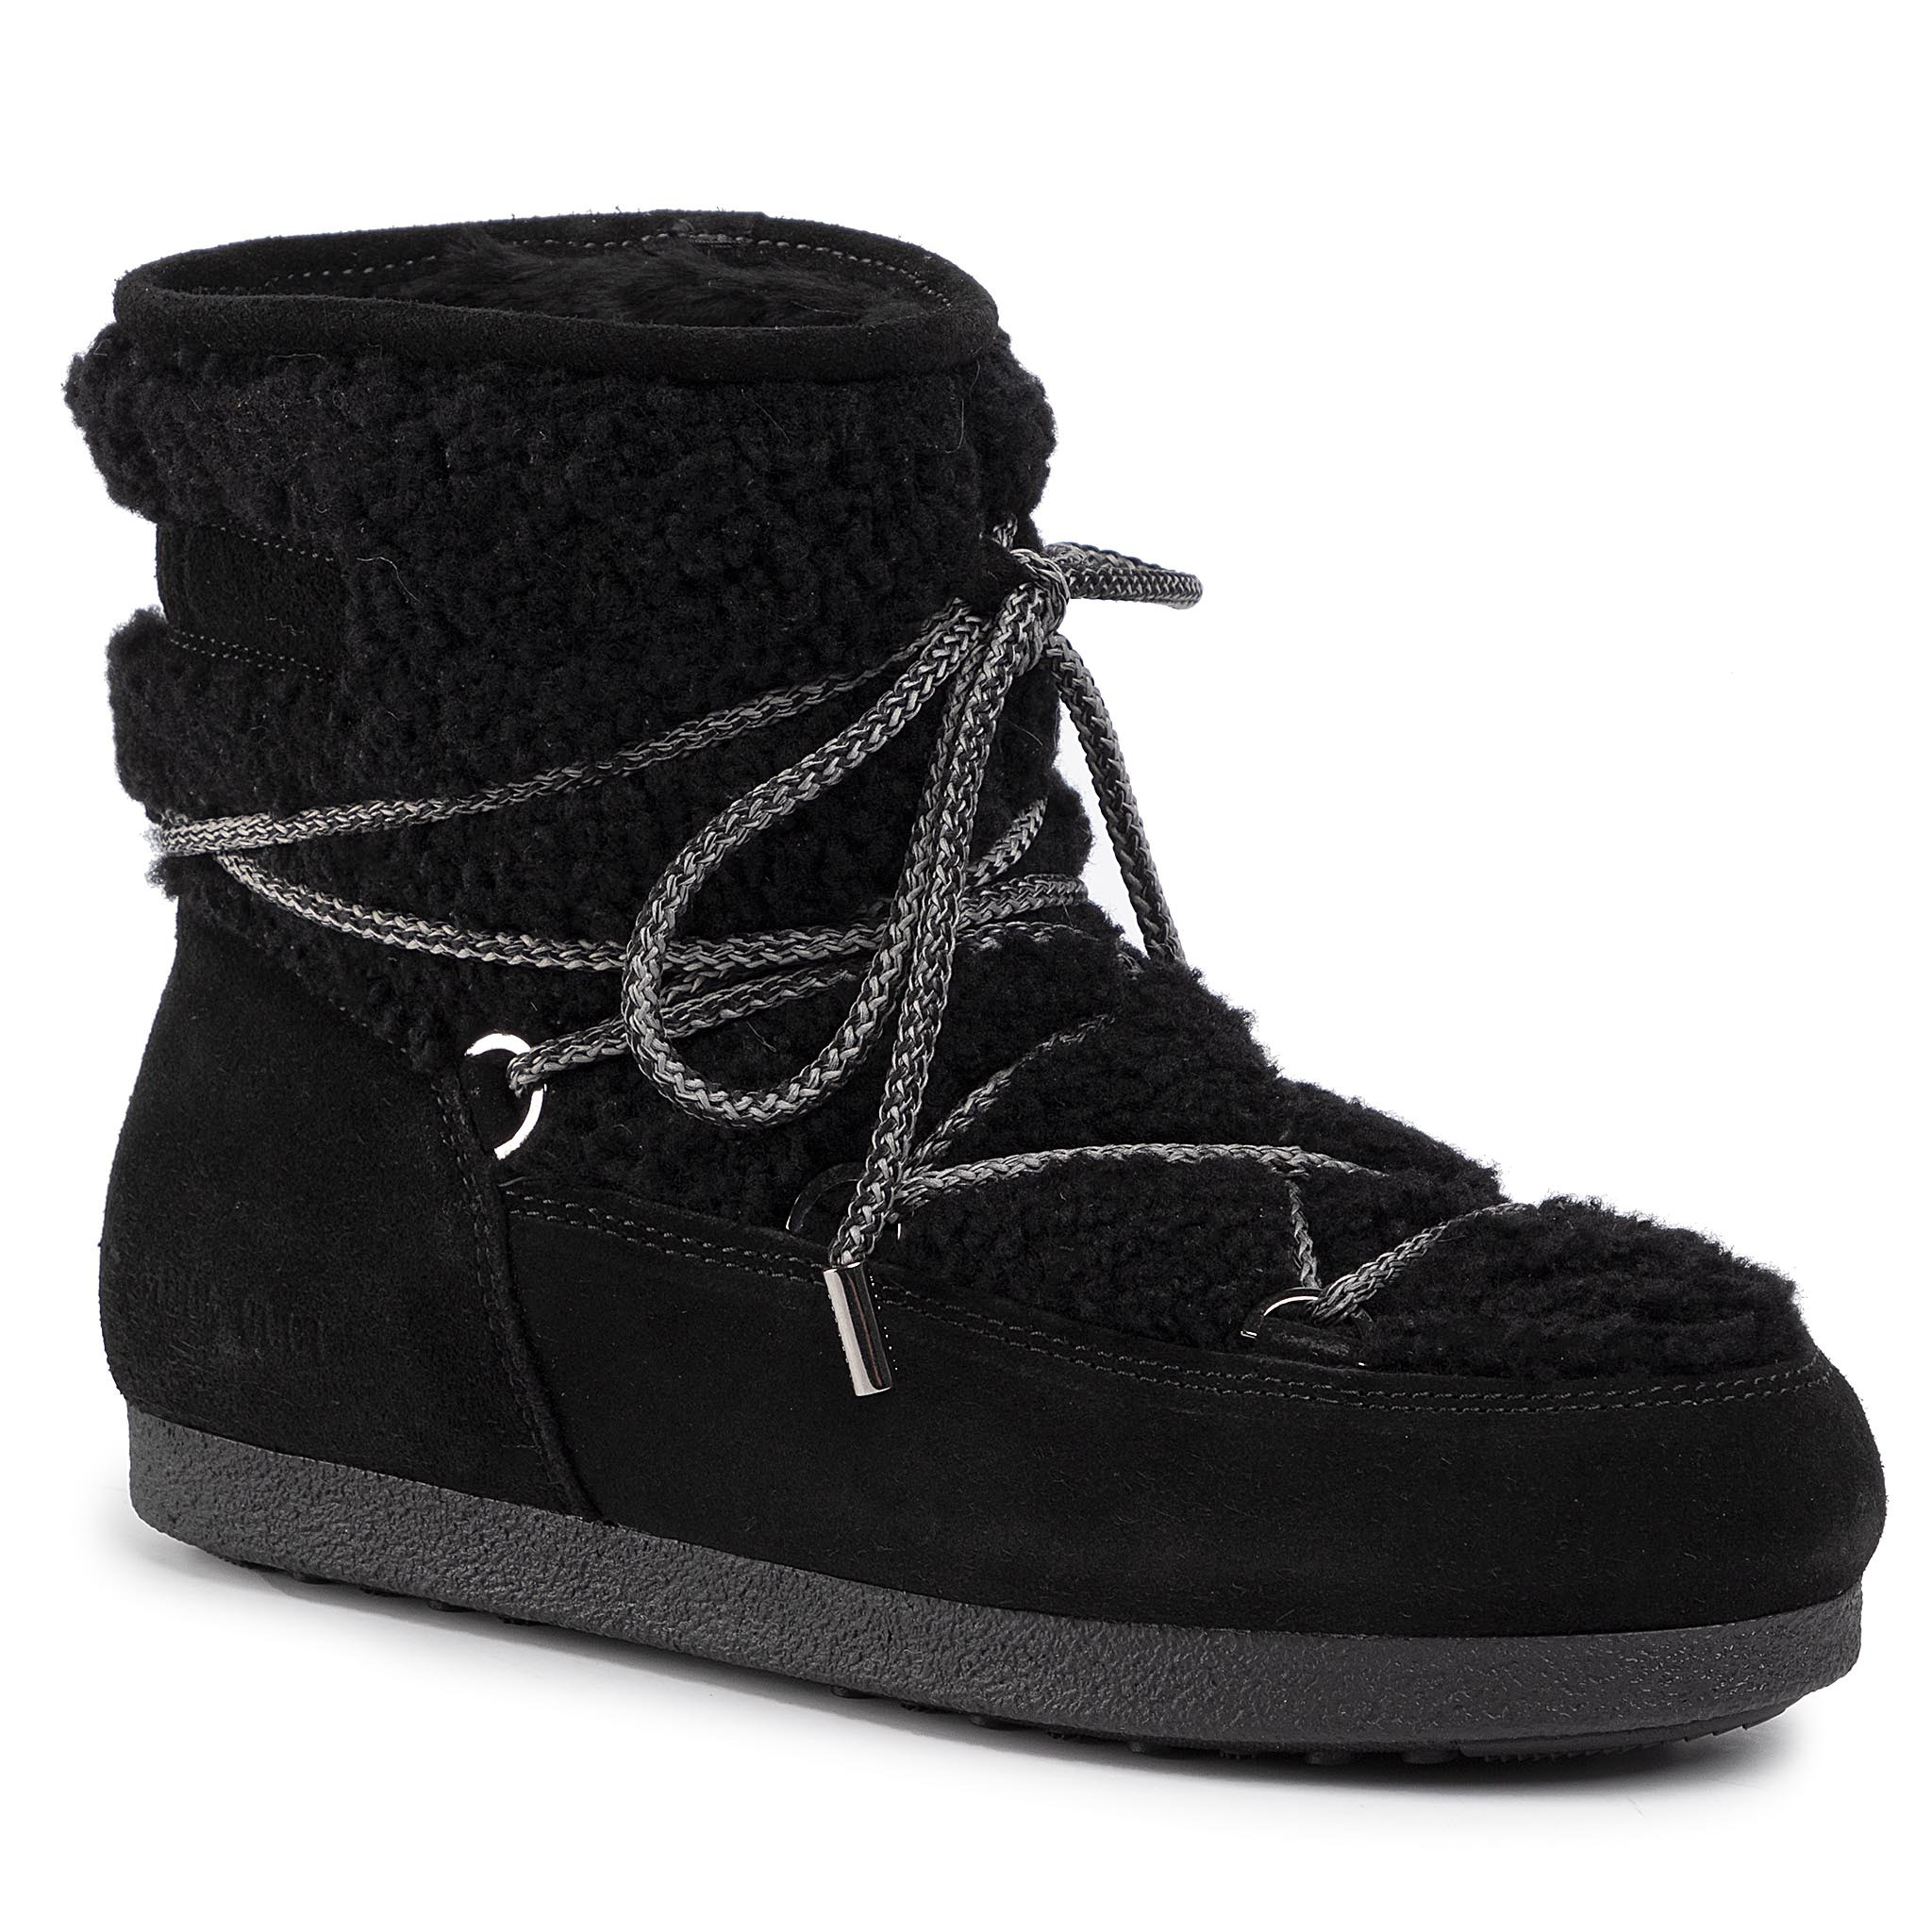 Cizme de zăpadă MOON BOOT - Far Side Low Shearl. 242008000003 Black